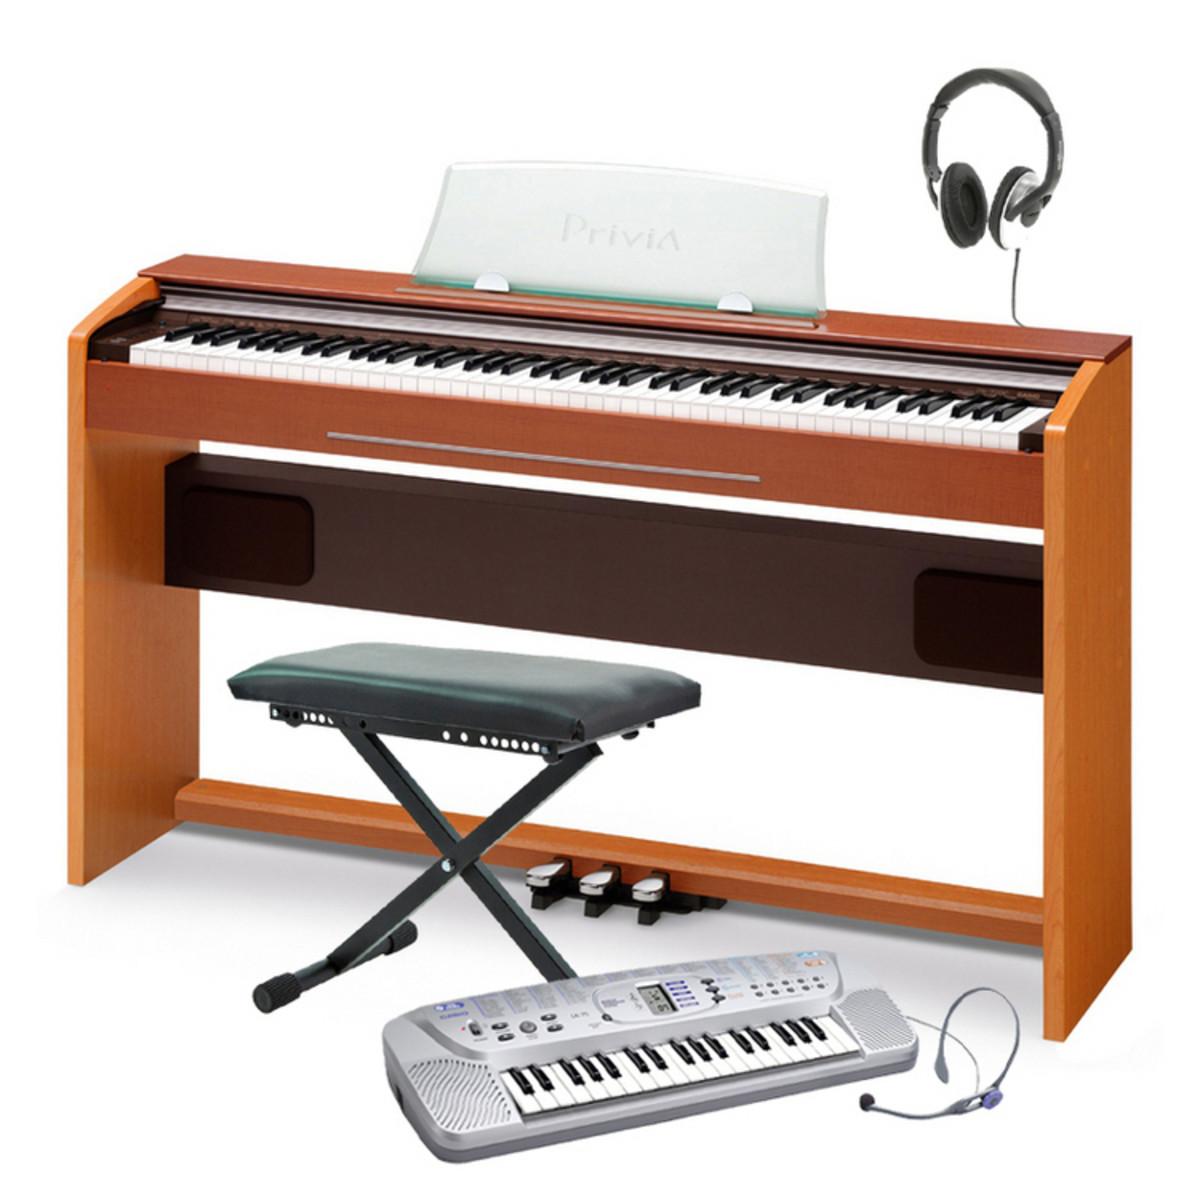 Digital Piano Free : casio privia px 720 digital piano free gifts at ~ Vivirlamusica.com Haus und Dekorationen